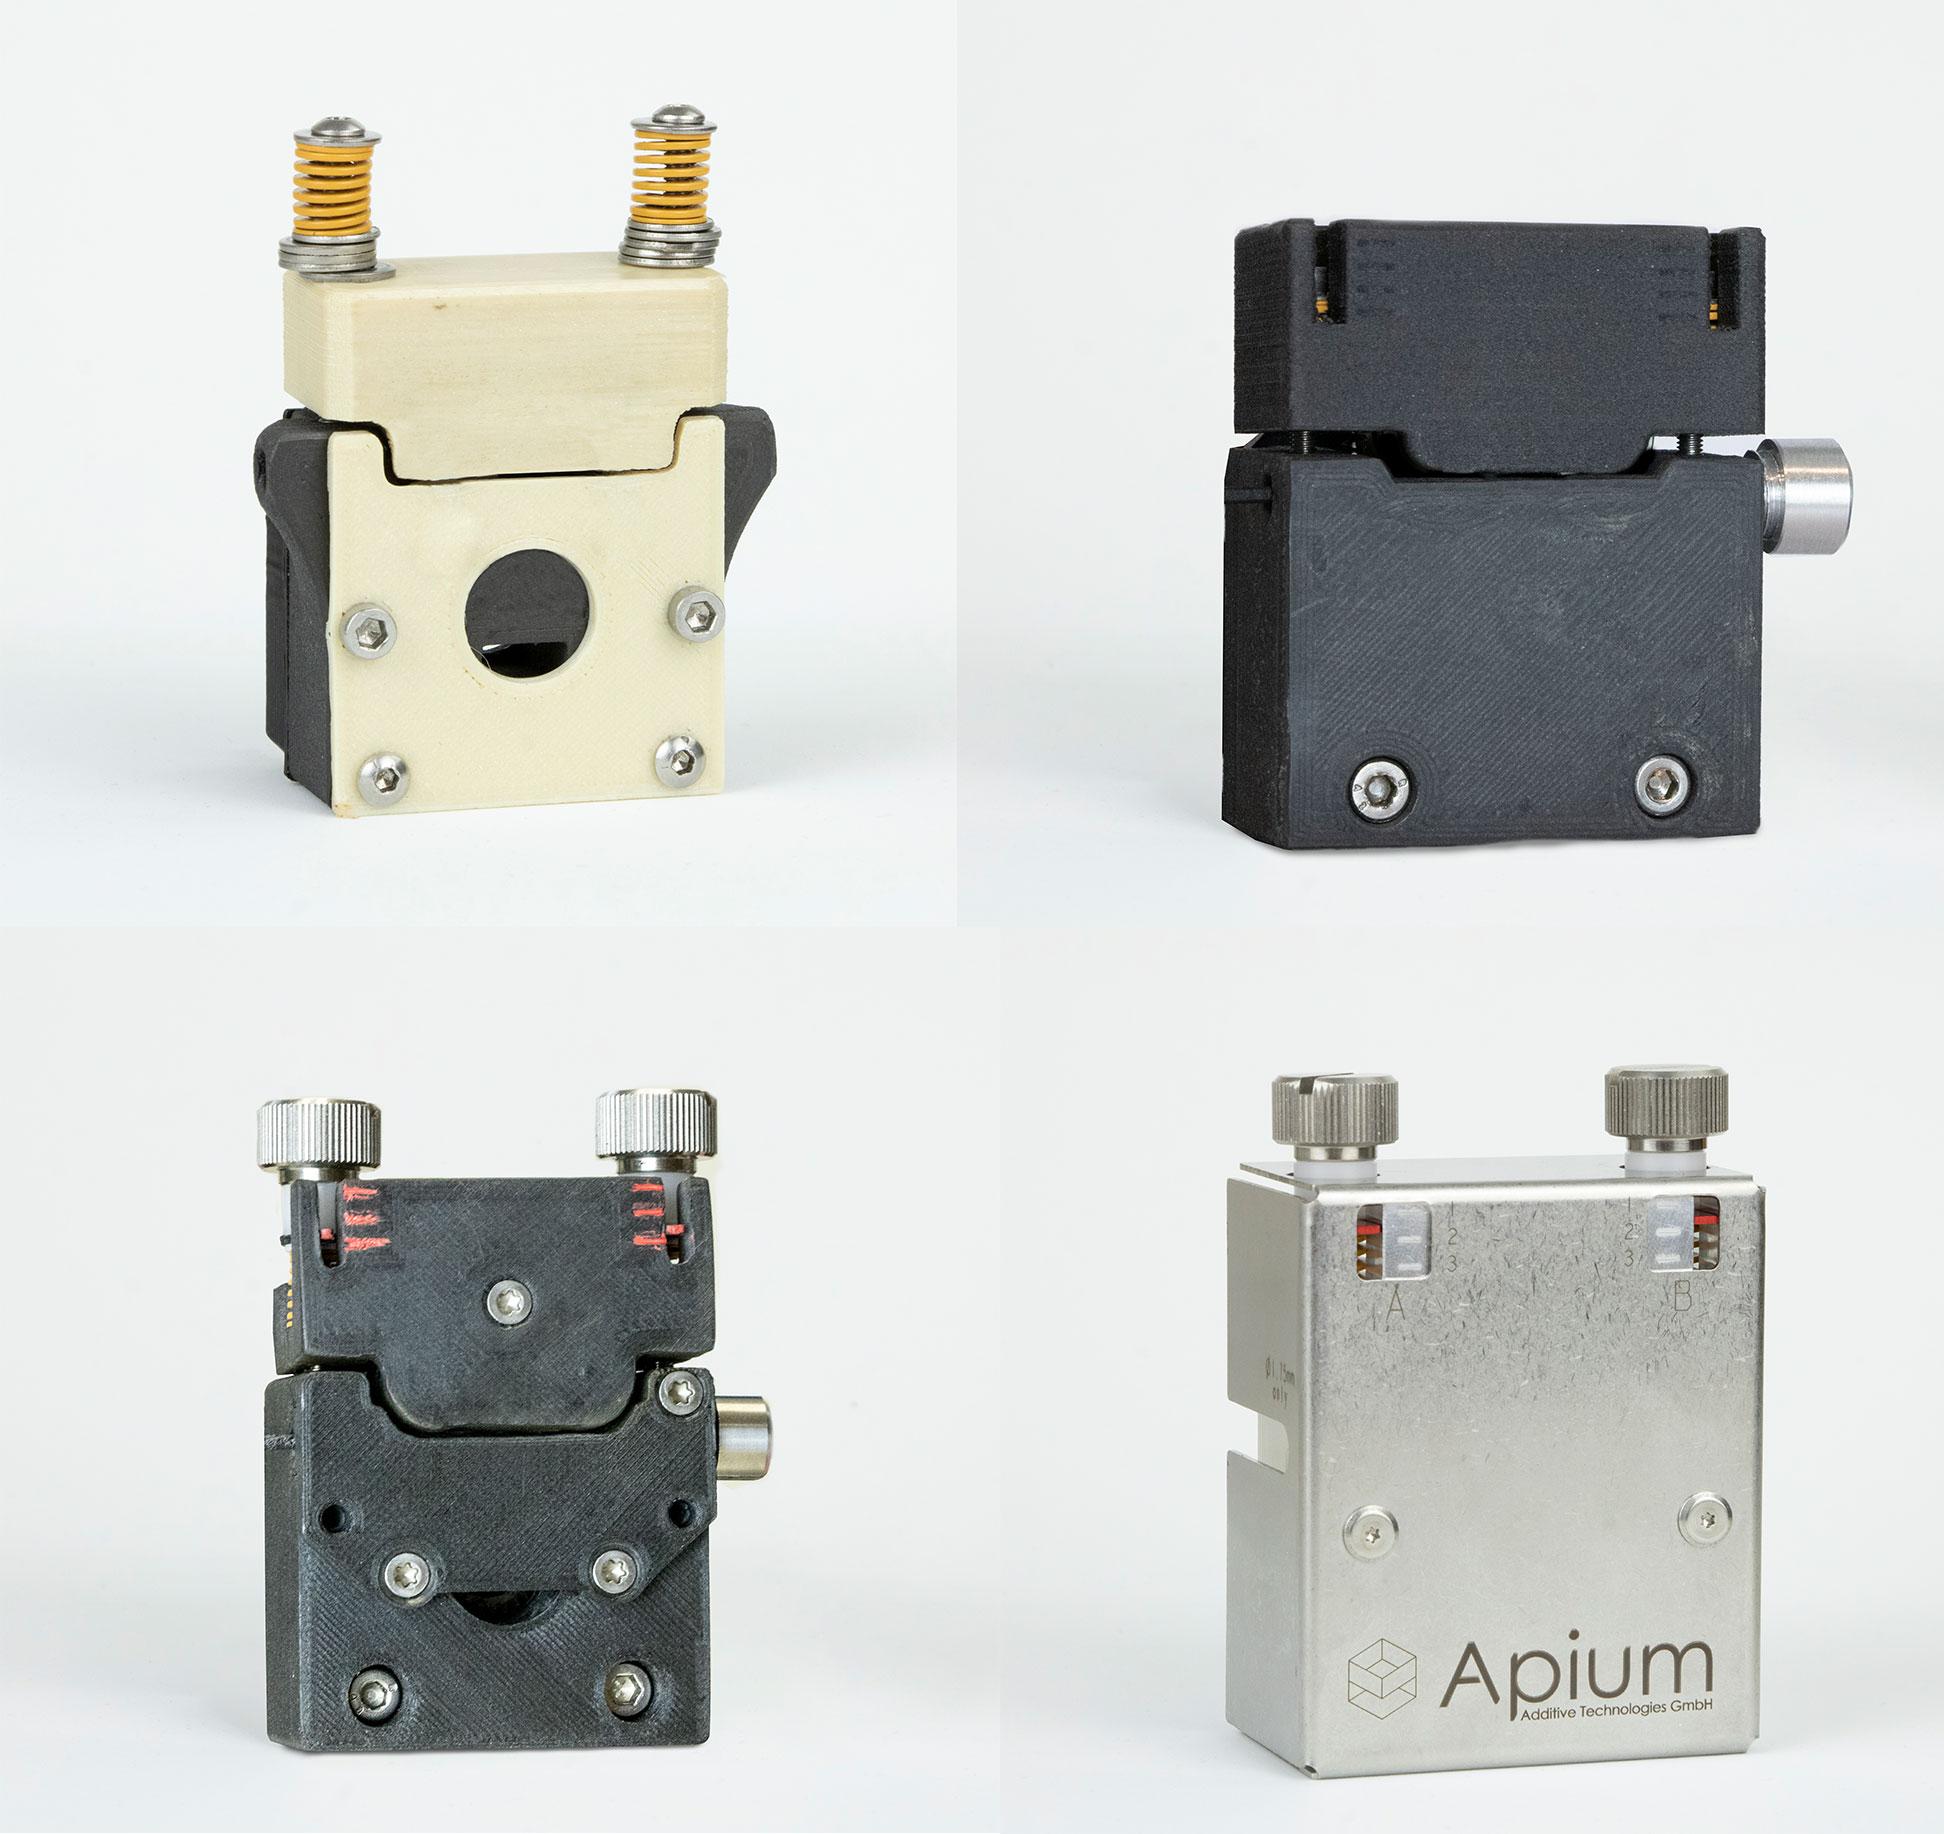 Apium Case Study - Advanced Extruder Technology